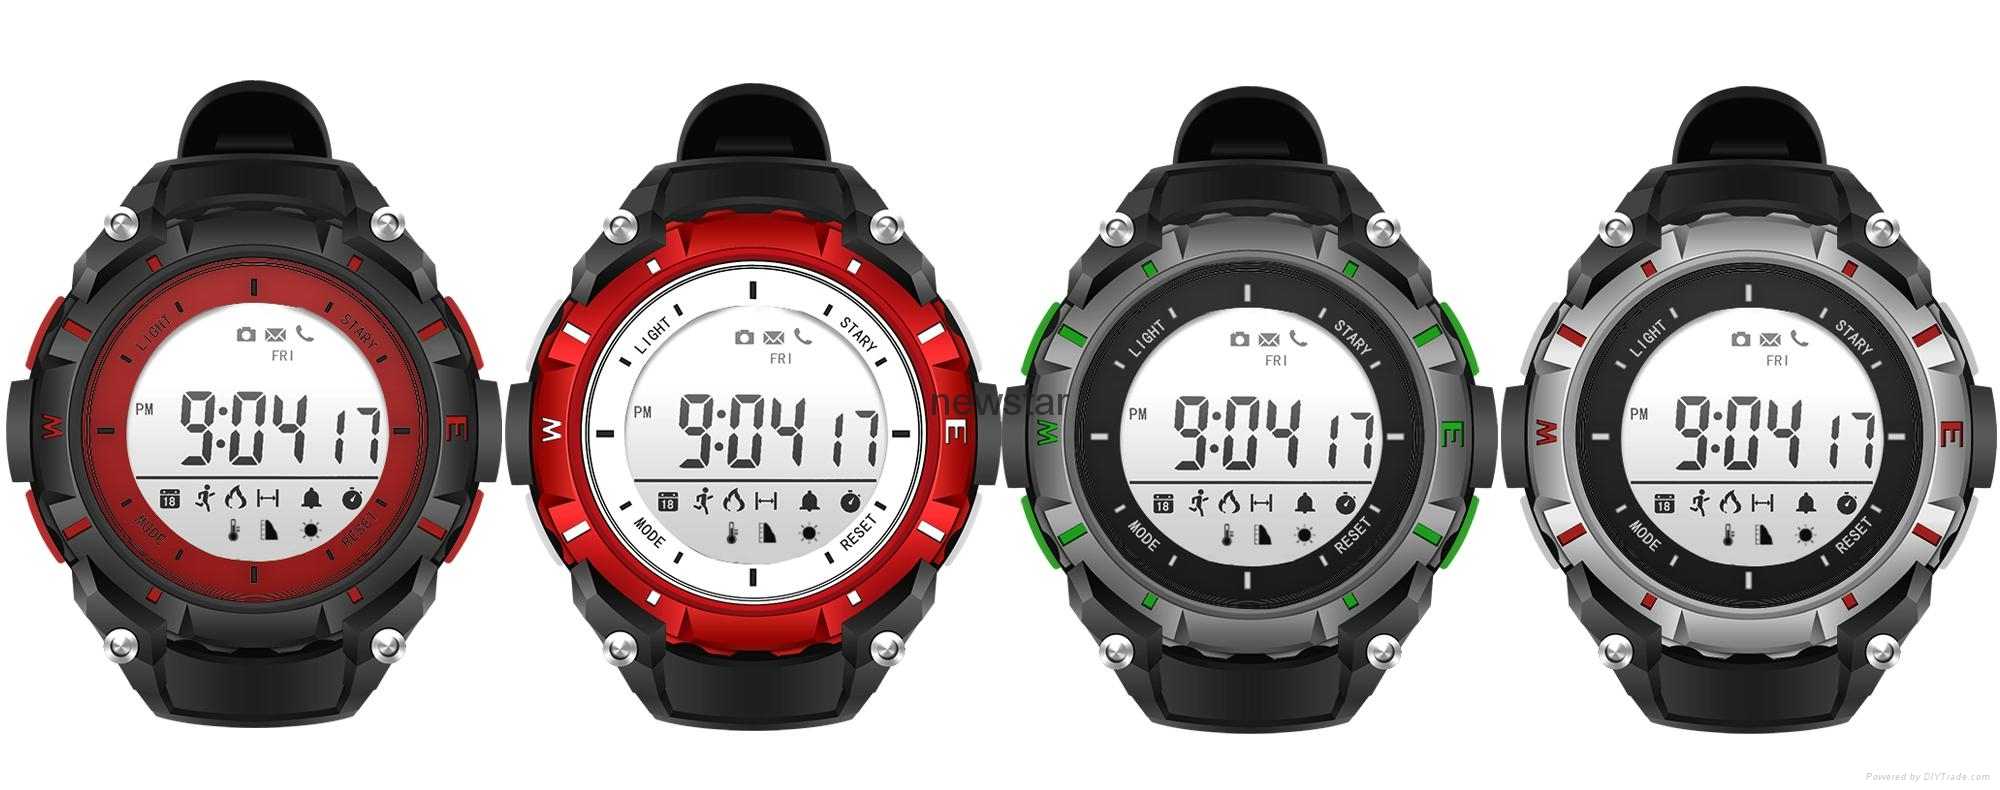 Bluetooth 30m water proof sport watch  5